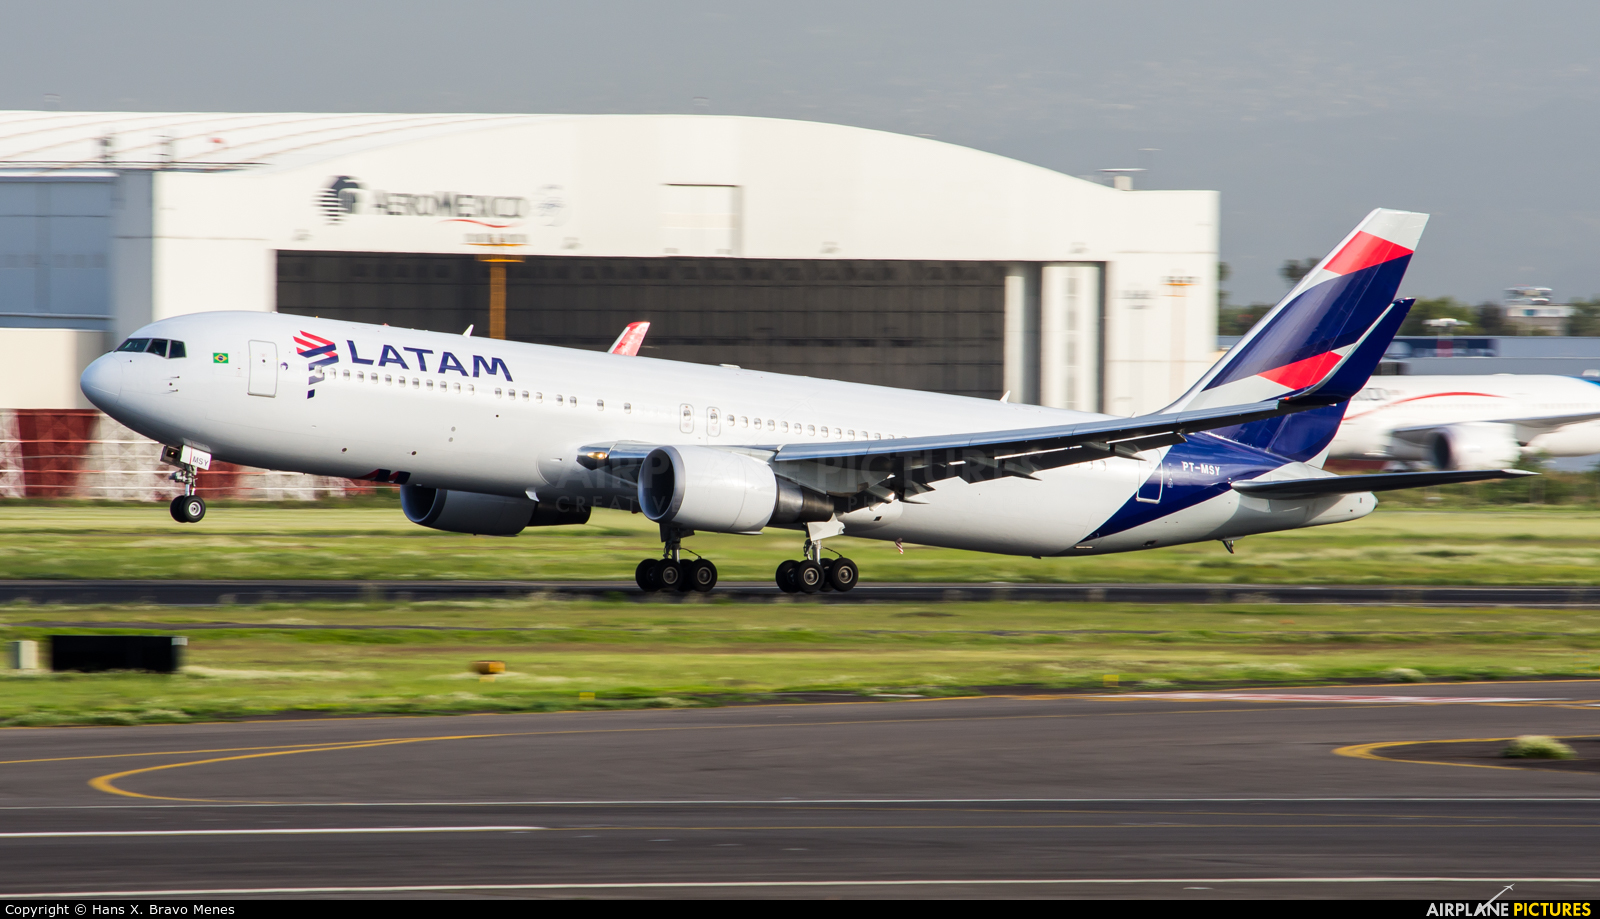 LATAM PT-MSY aircraft at Mexico City - Licenciado Benito Juarez Intl